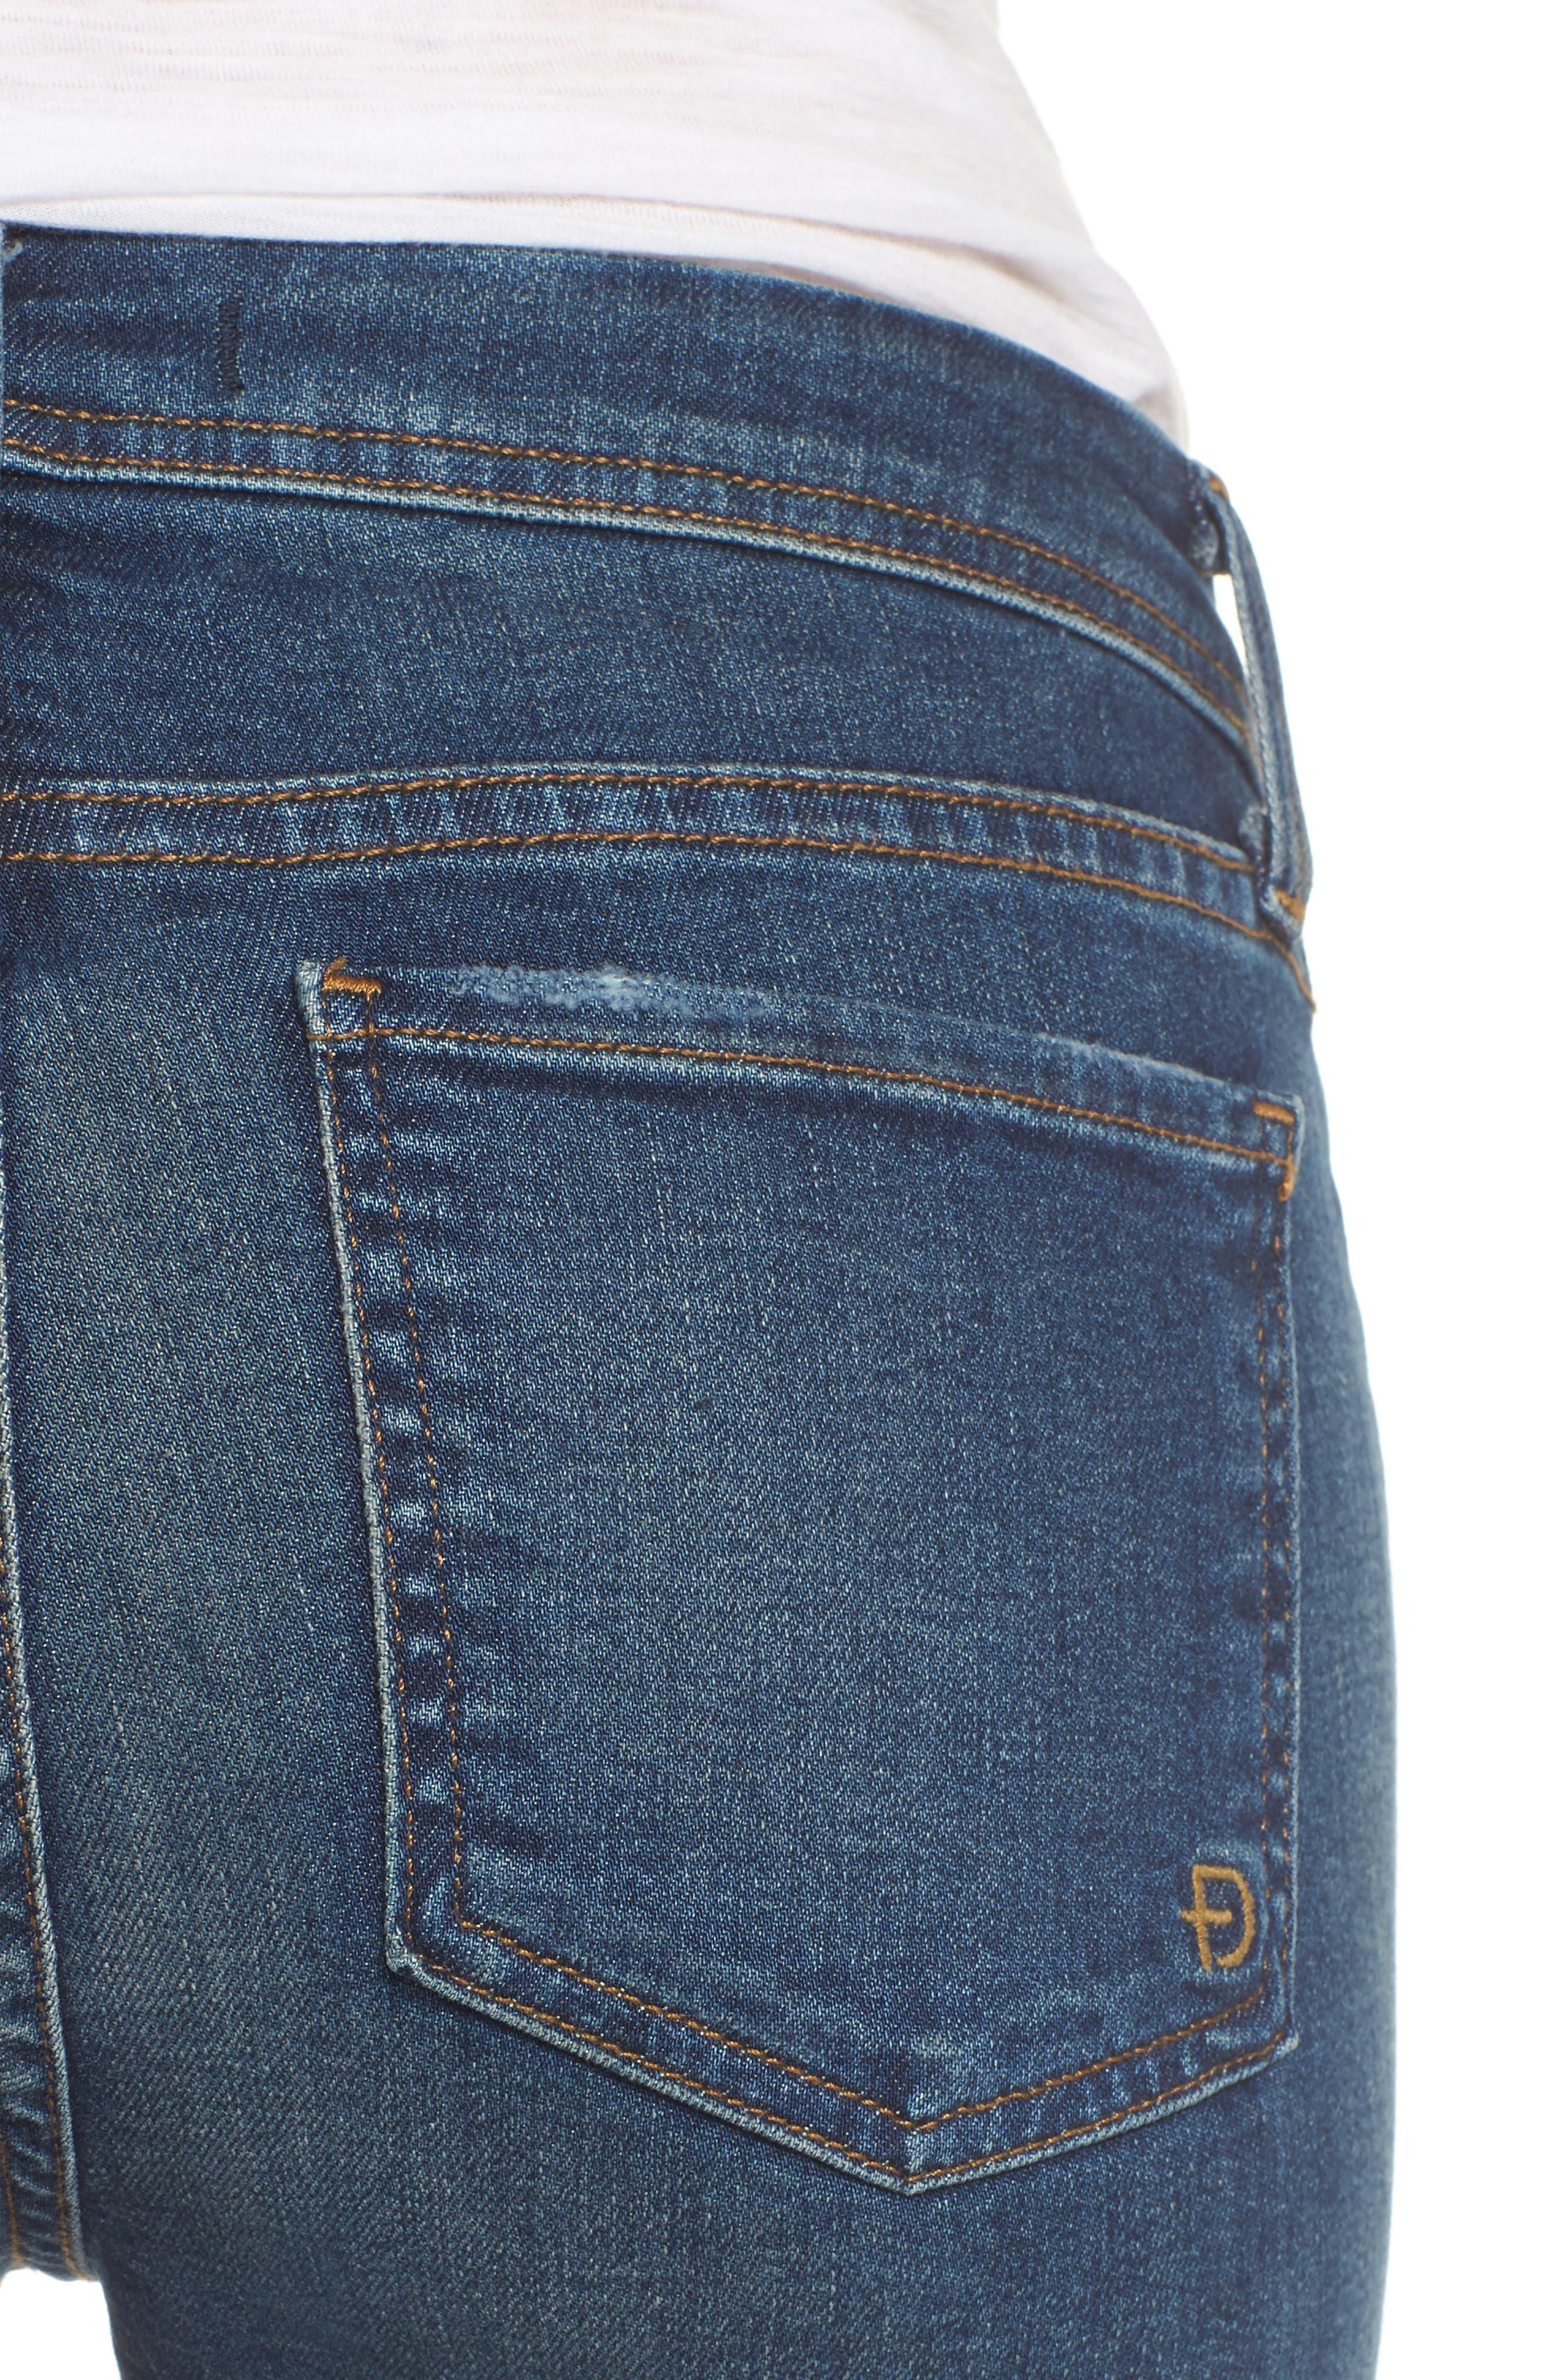 Belvedere Crop Skinny Jeans,                             Alternate thumbnail 4, color,